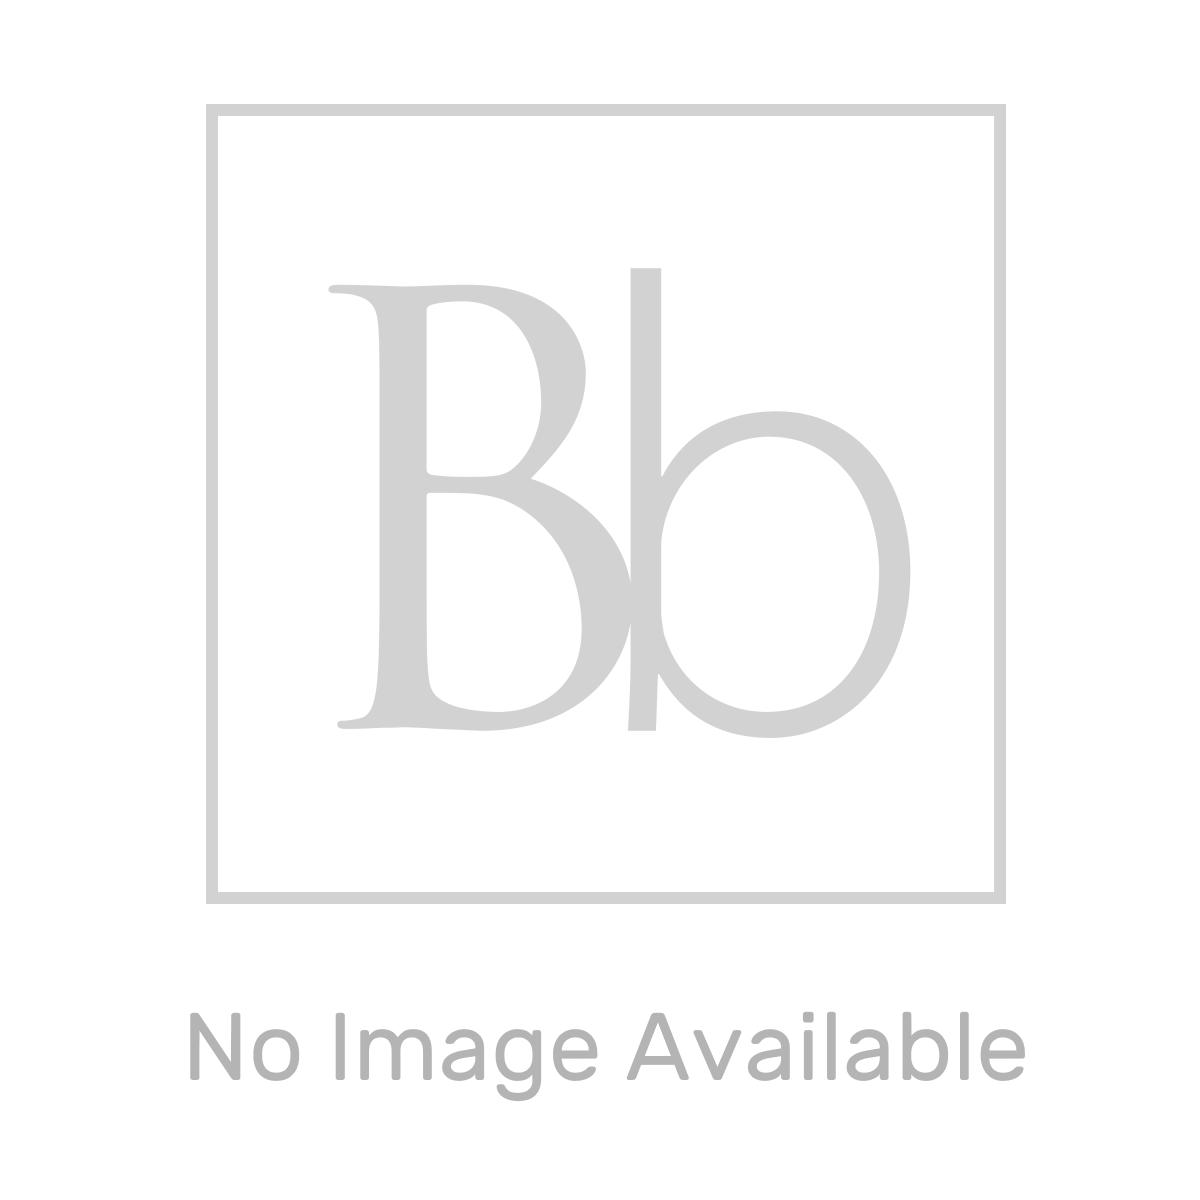 RAK Moon Illuminated LED Mirror 1200 x 500mm Lifestyle